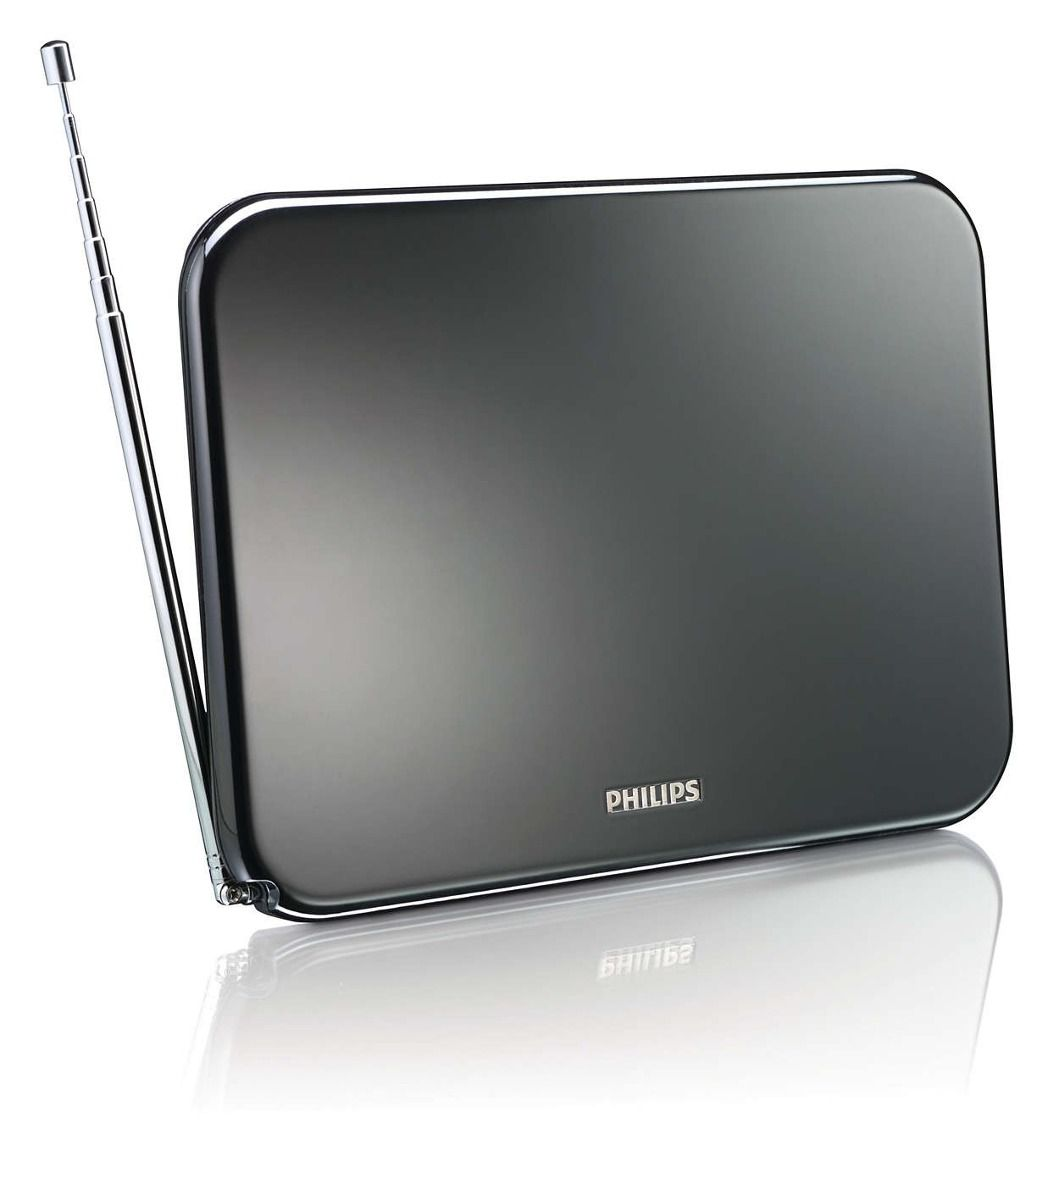 Antena Philips Uhf / Vhf Amplificada 25db